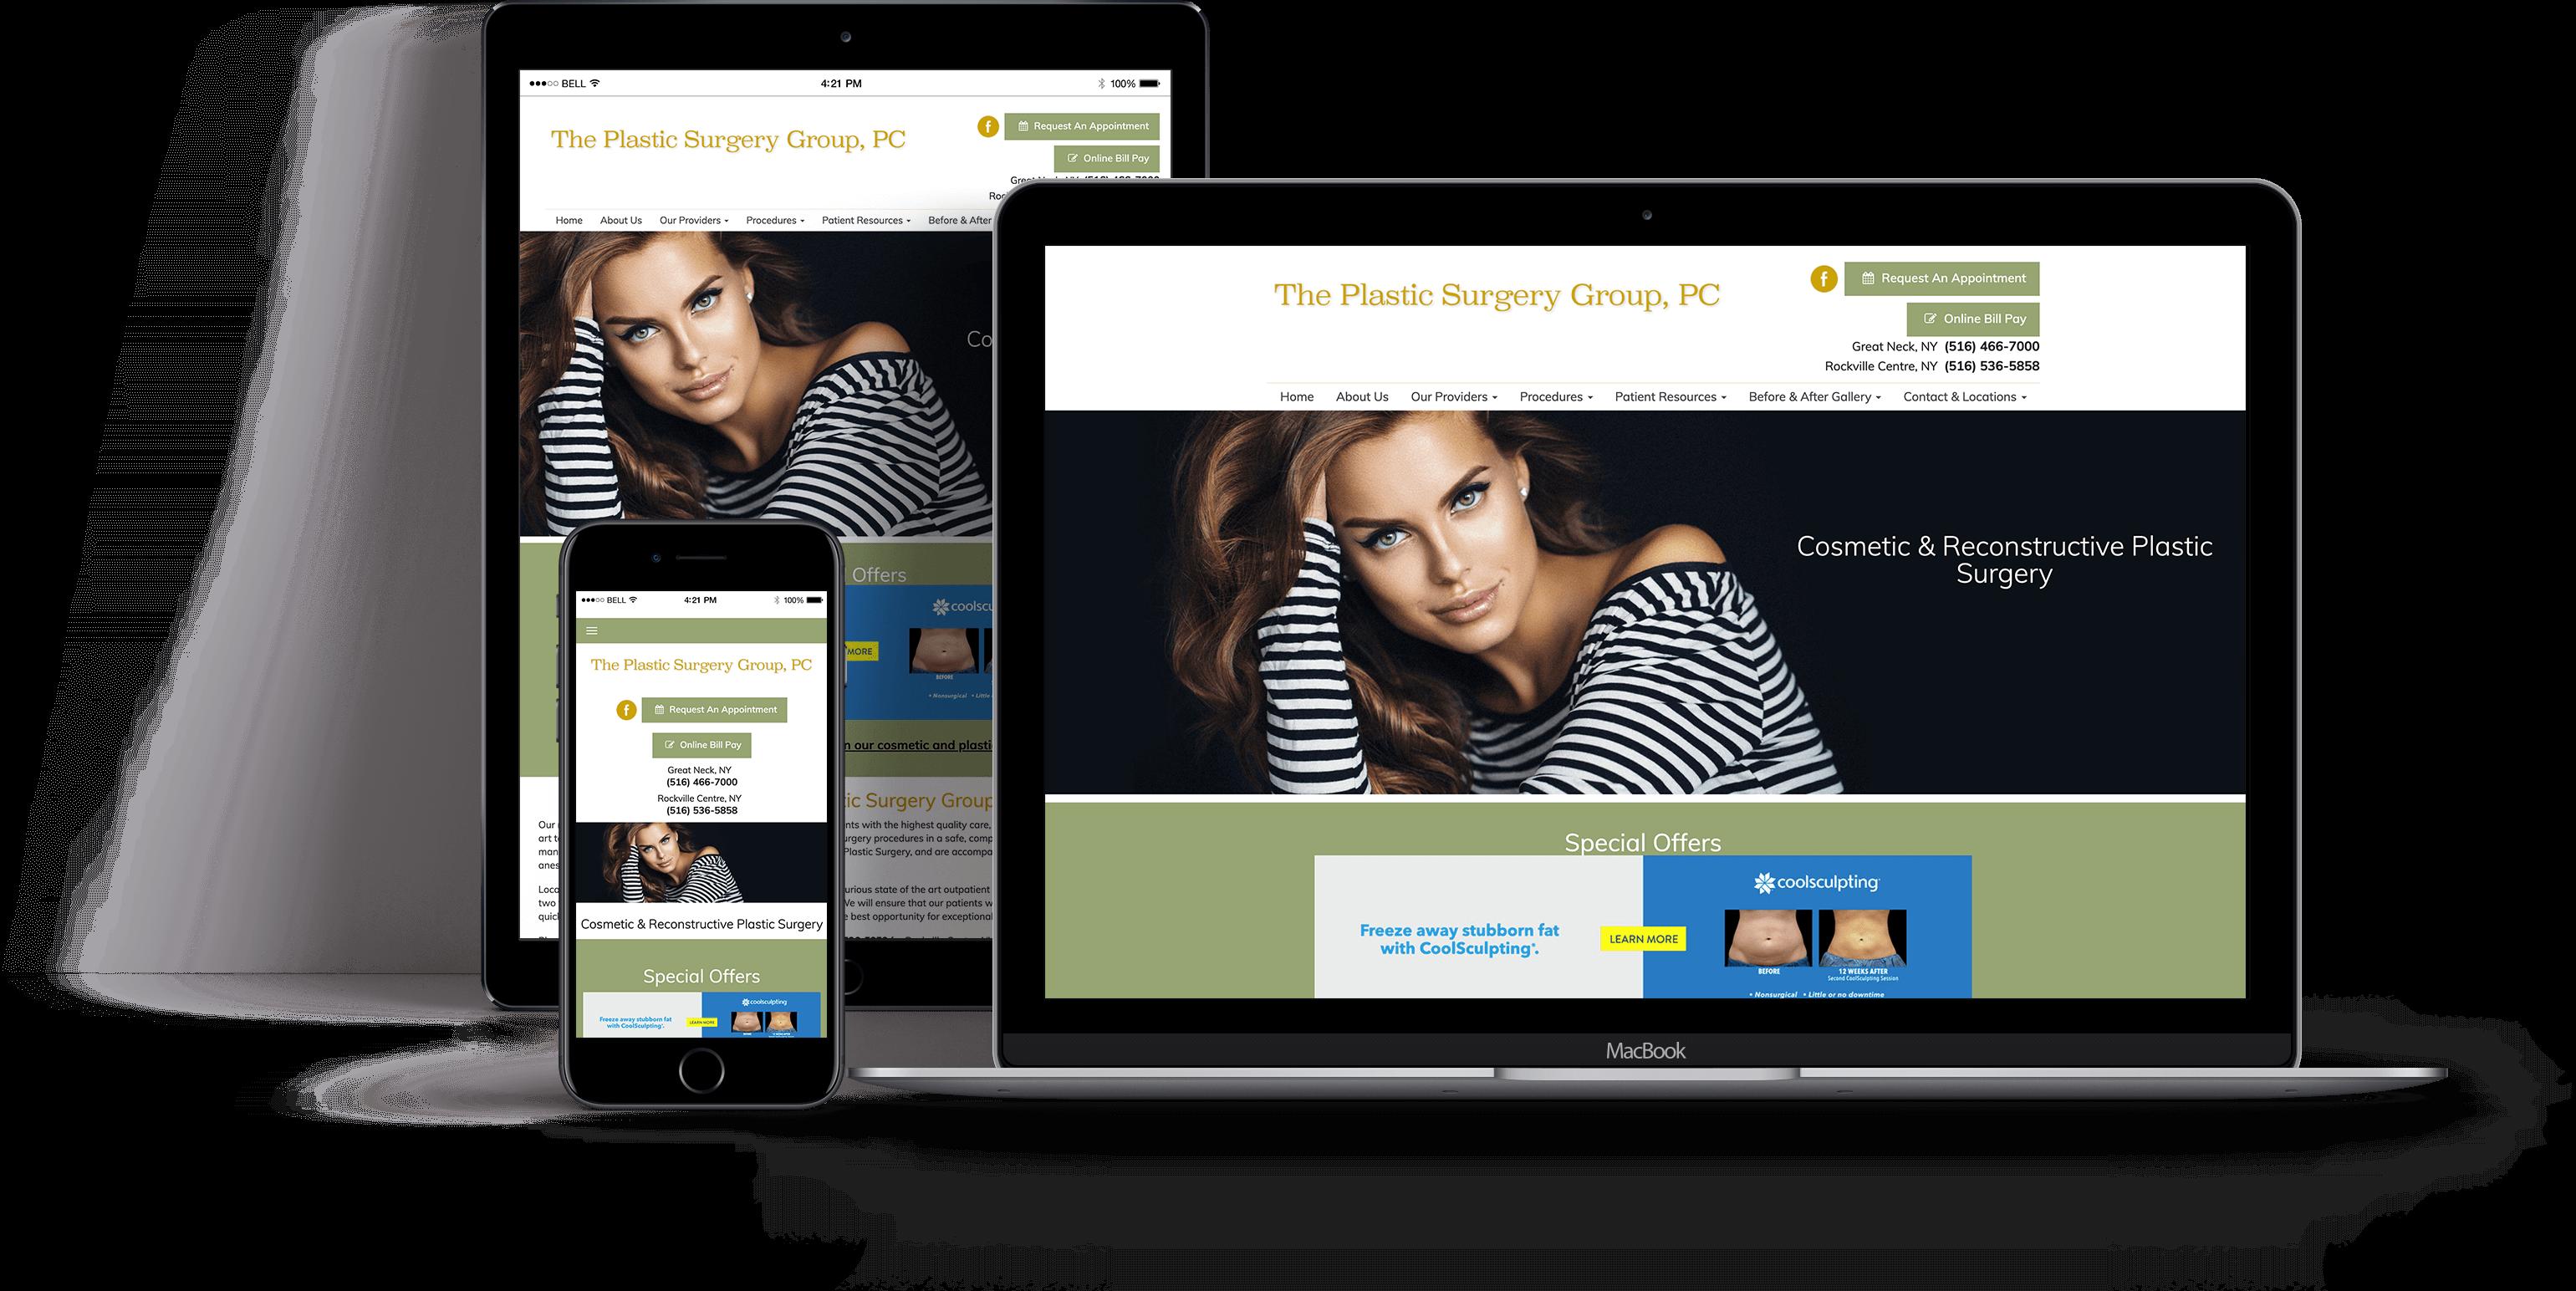 Website Design for OBGYN - iHealthSpot Interactive - healthcare digital marketing